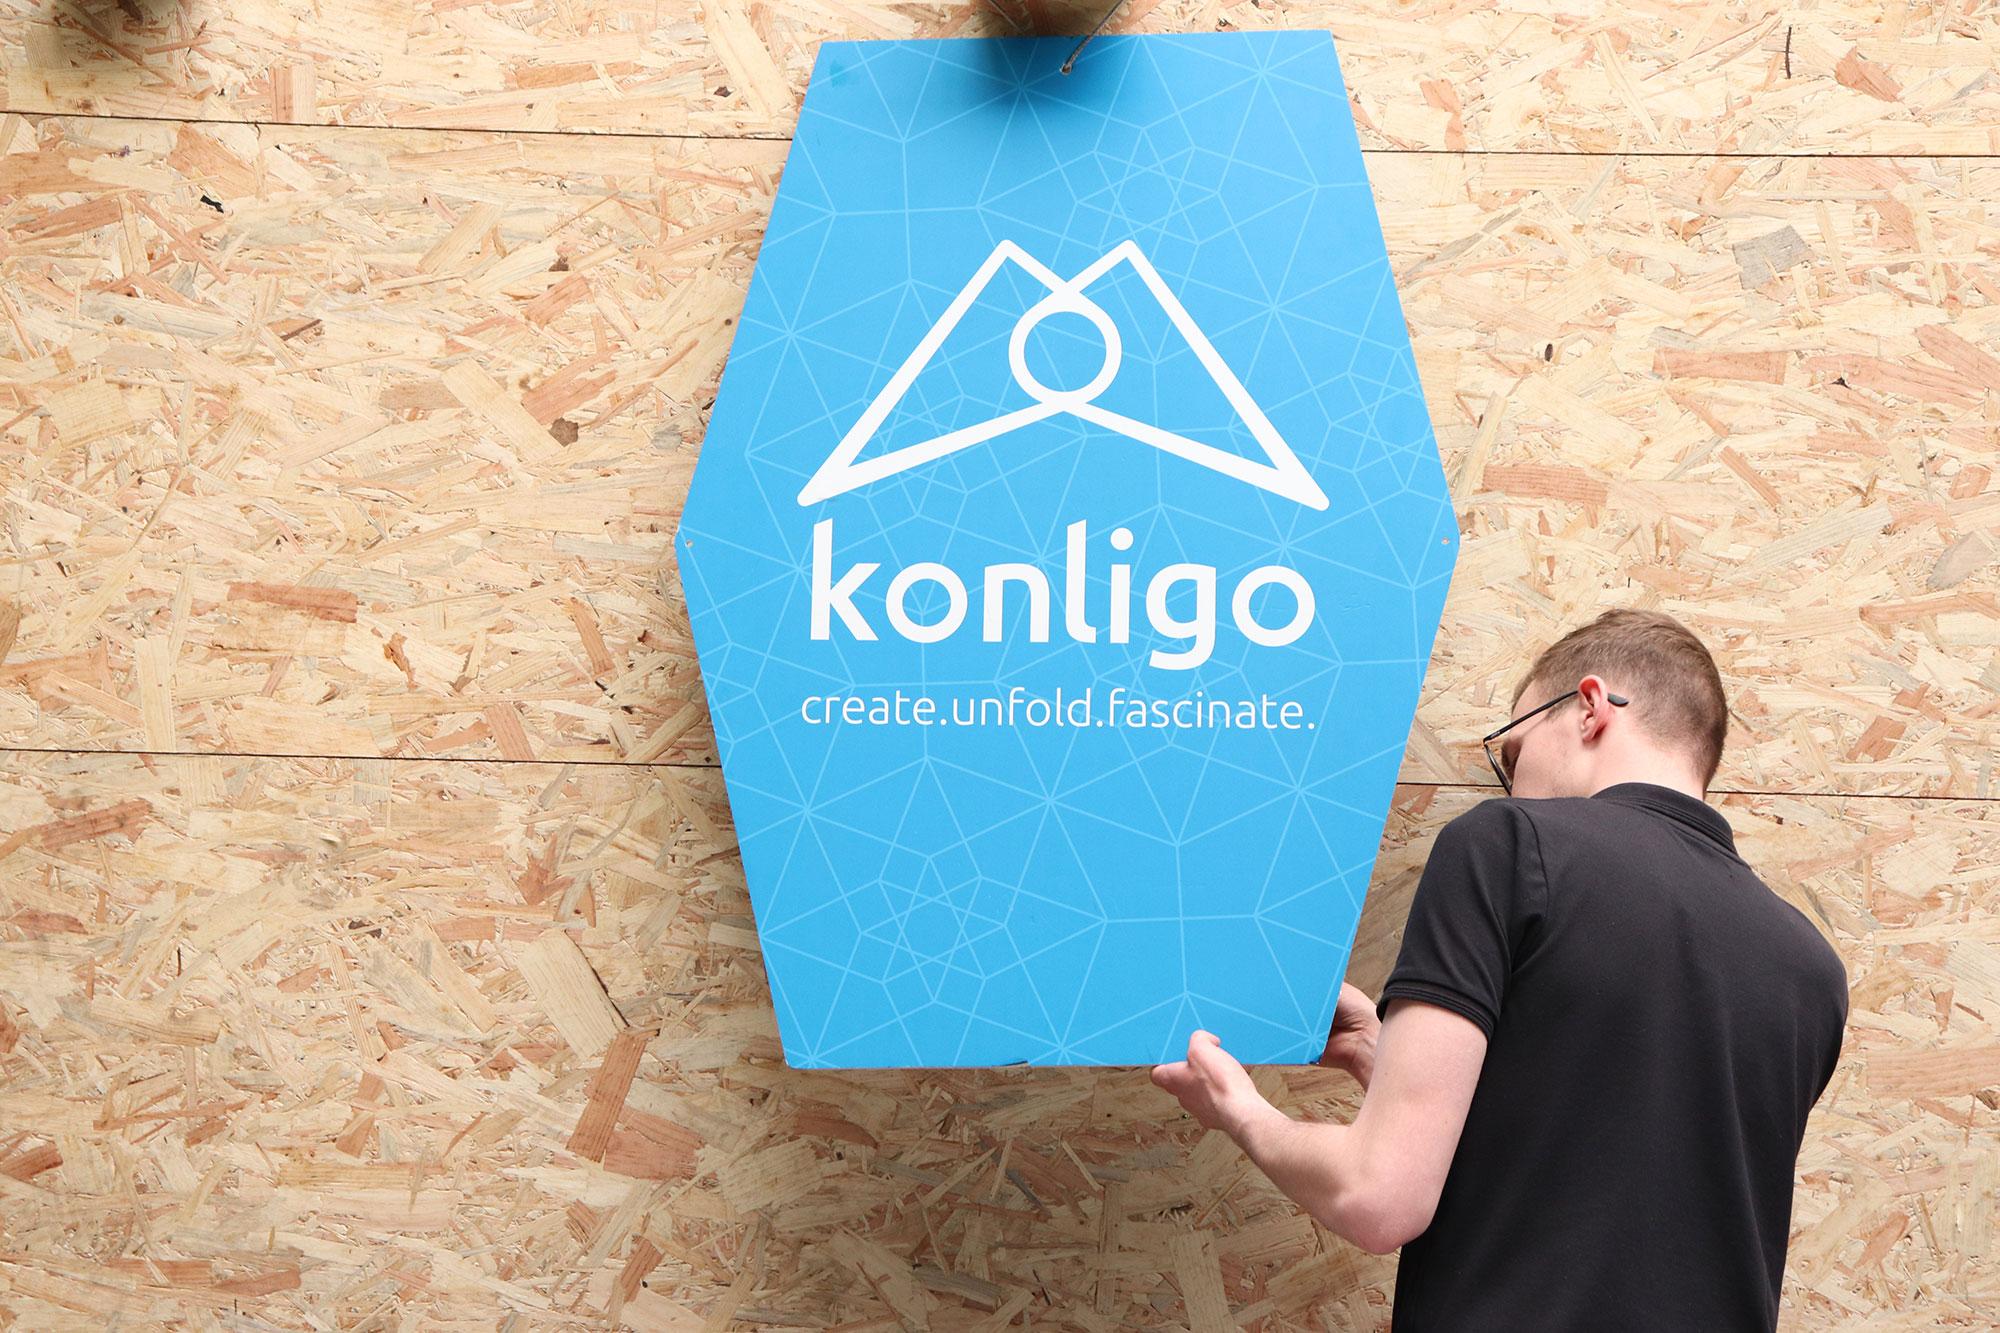 Employee looking at Konligo Logo in search of identity